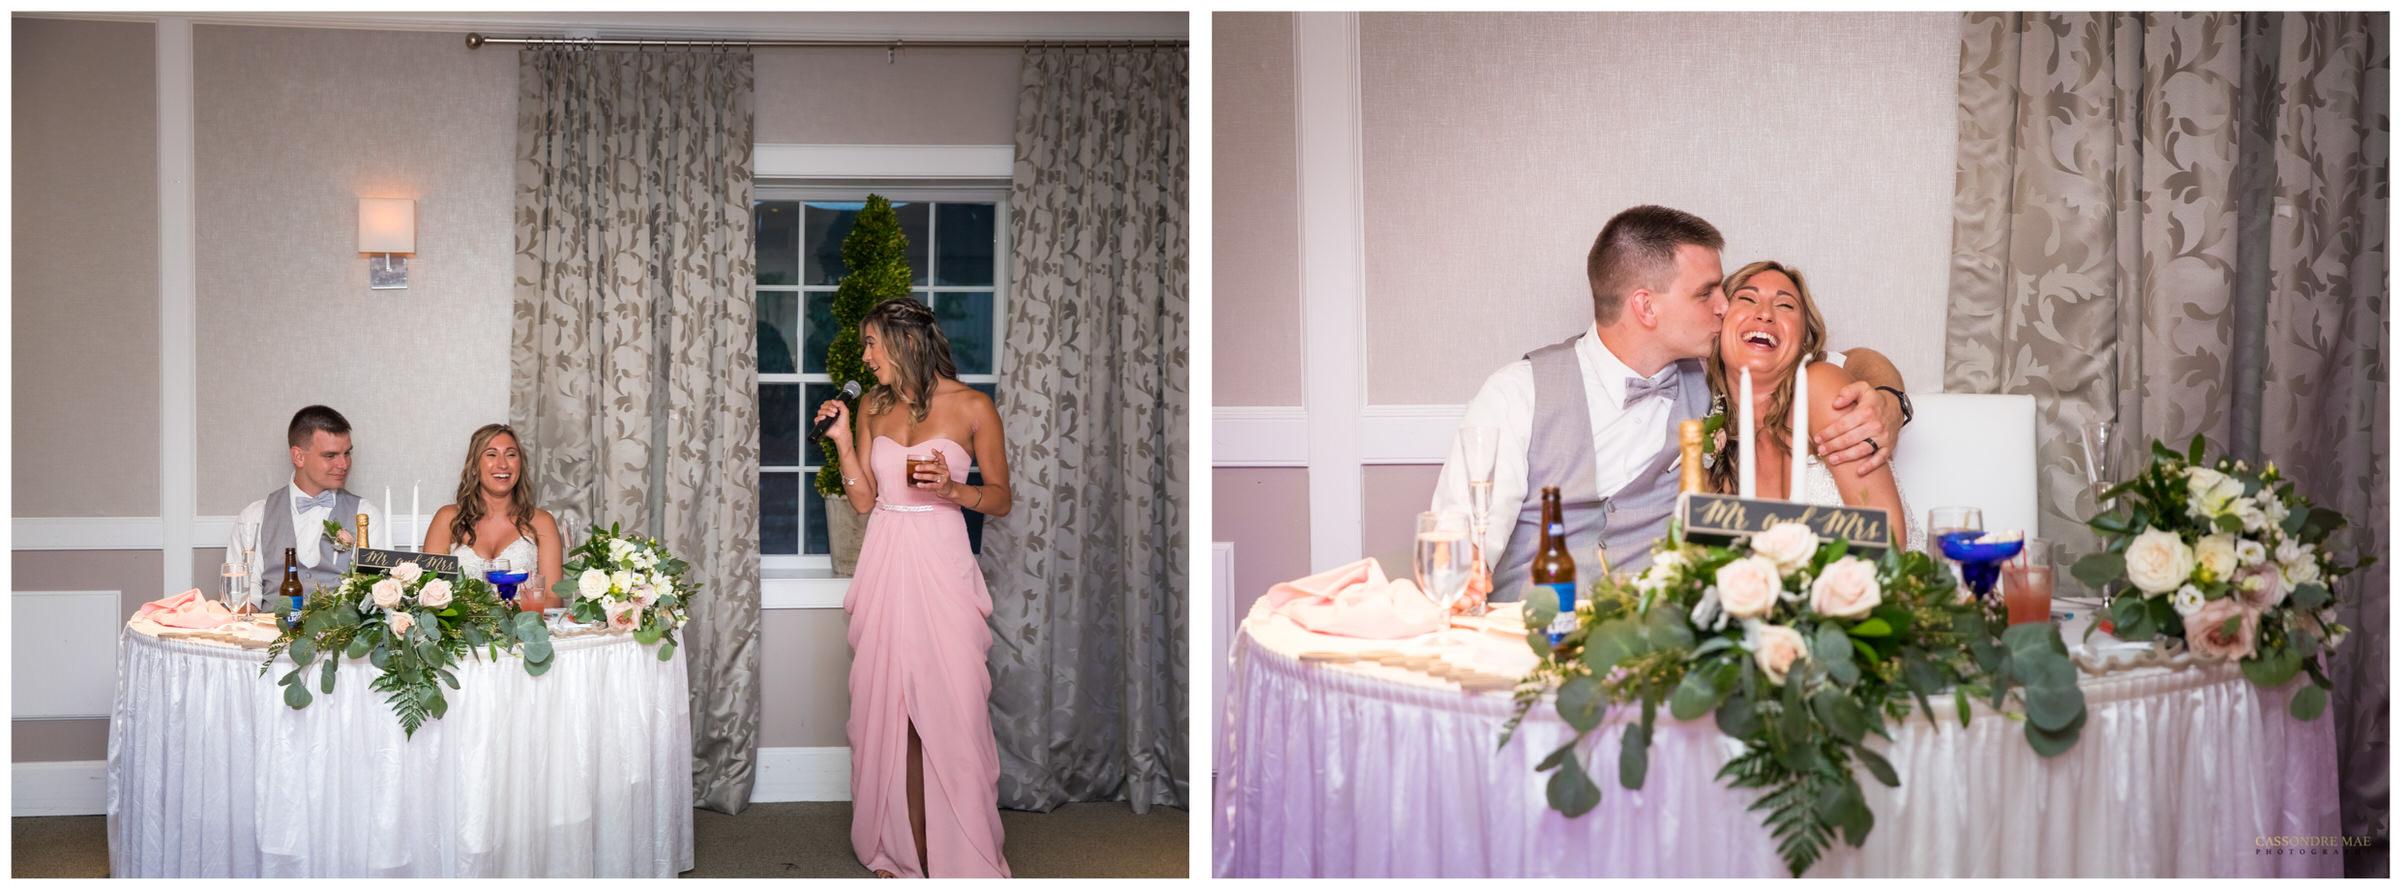 Cassondre Mae Photography Hudson Valley Wedding 34.jpg